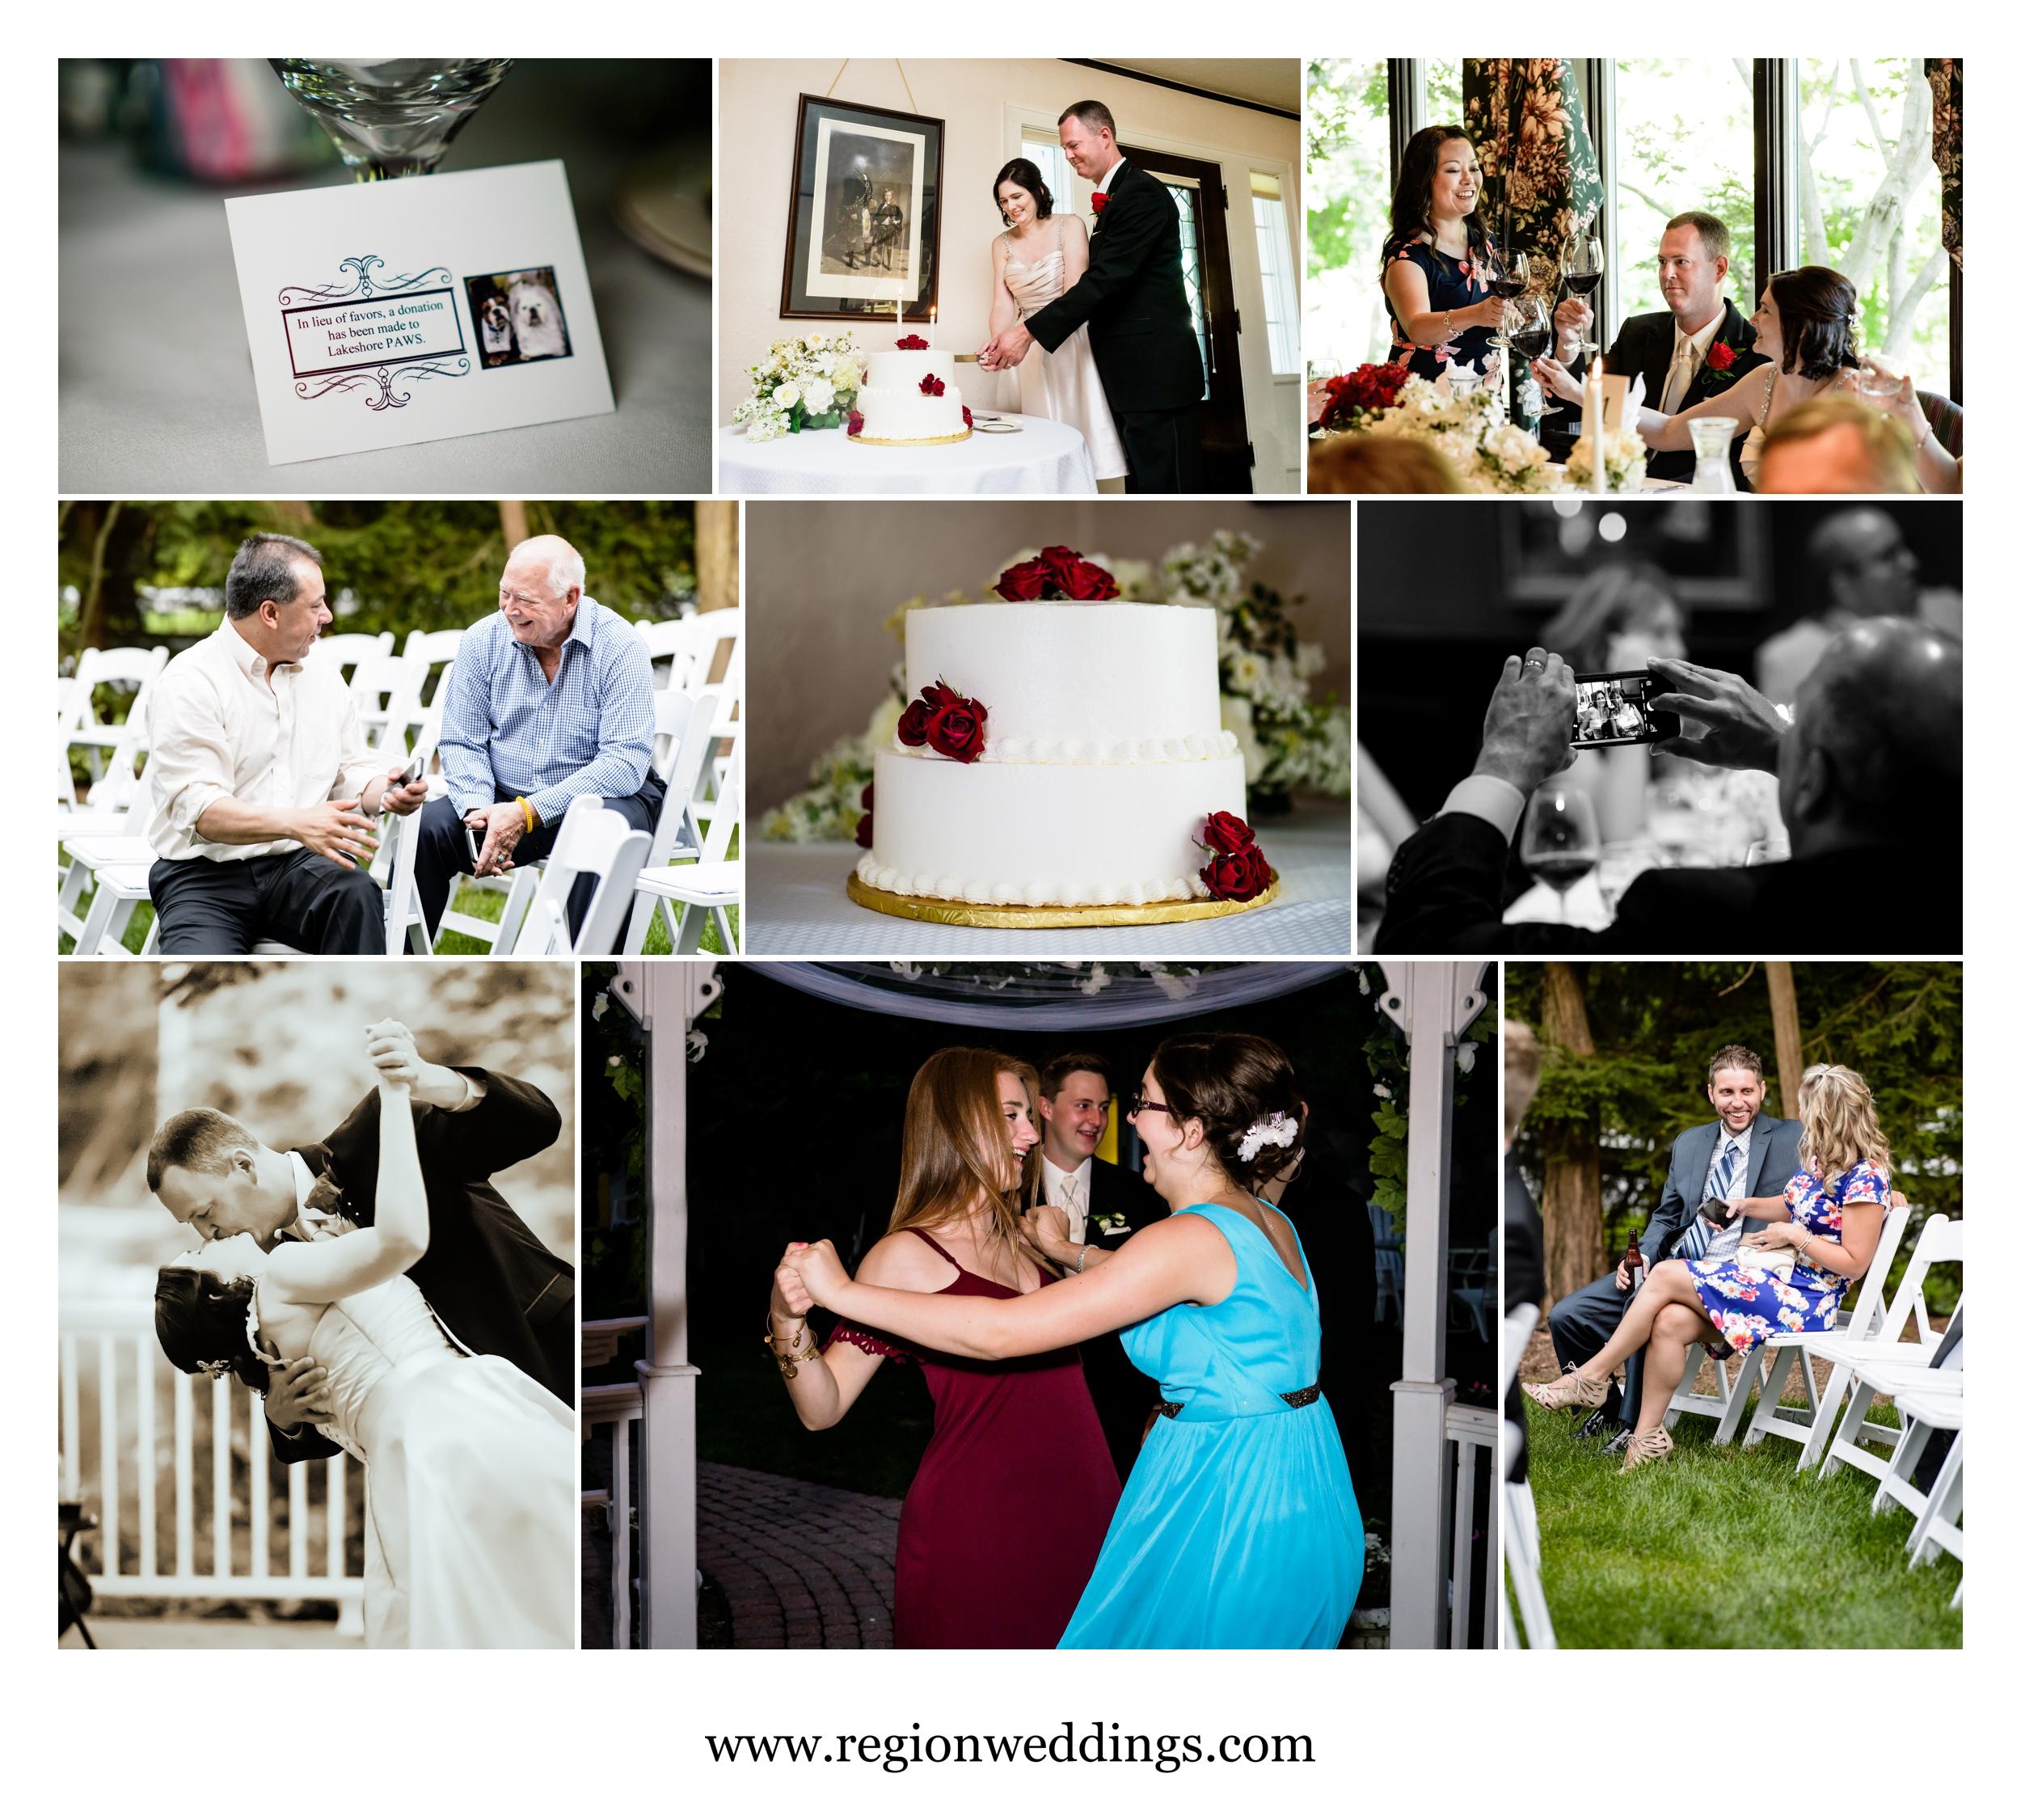 Wedding reception at The Inn At Aberdeen in Valparaiso, Indiana.